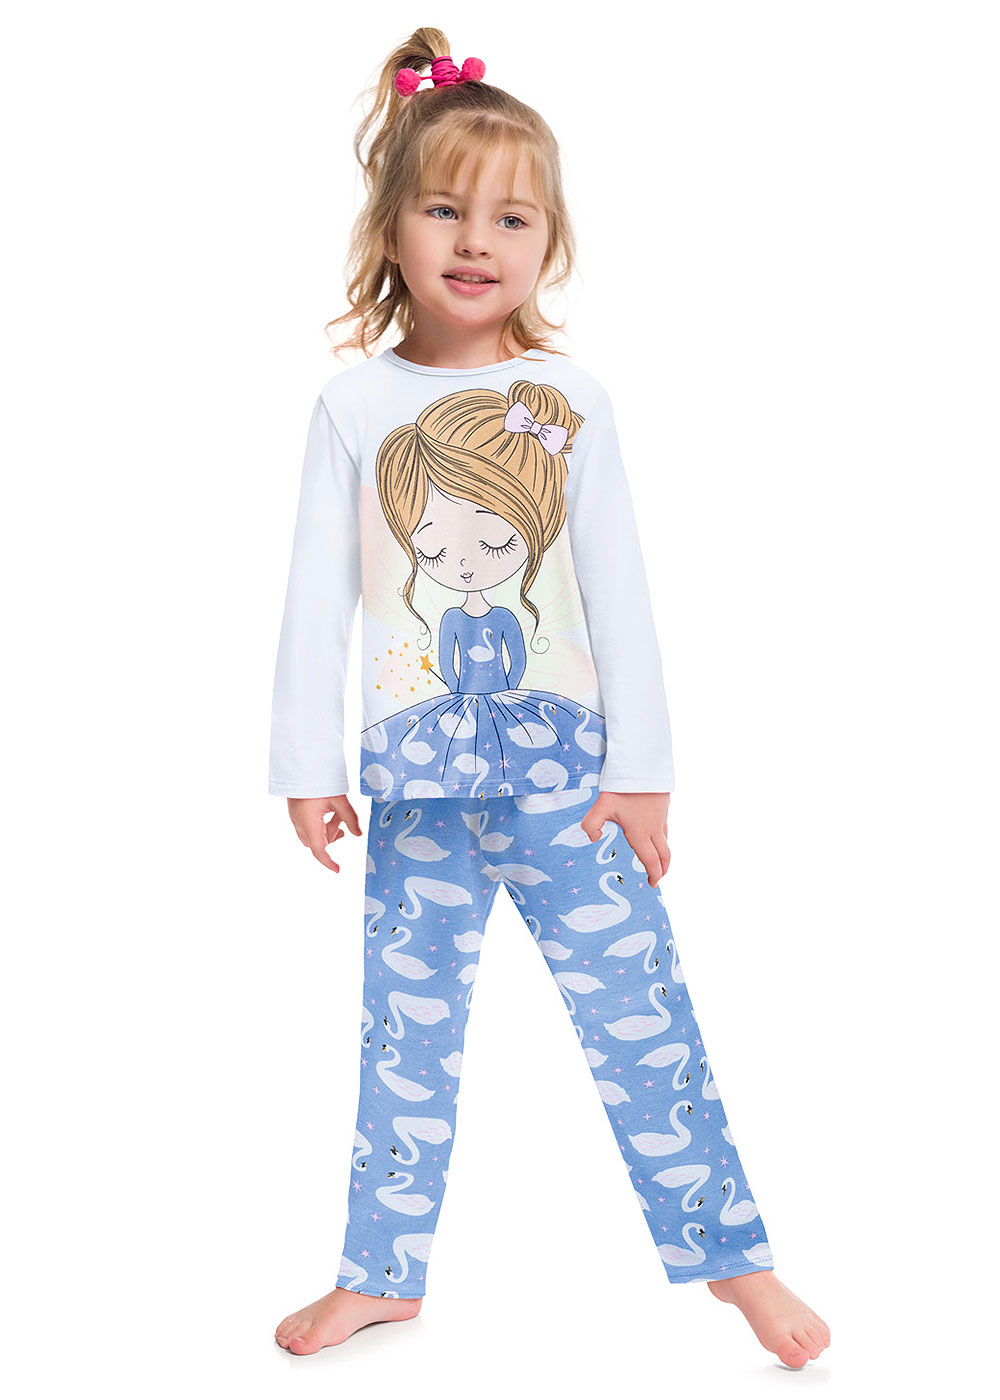 Pijama Infantil Feminino Inverno Branco Fada Brilha no Escuro - Kyly